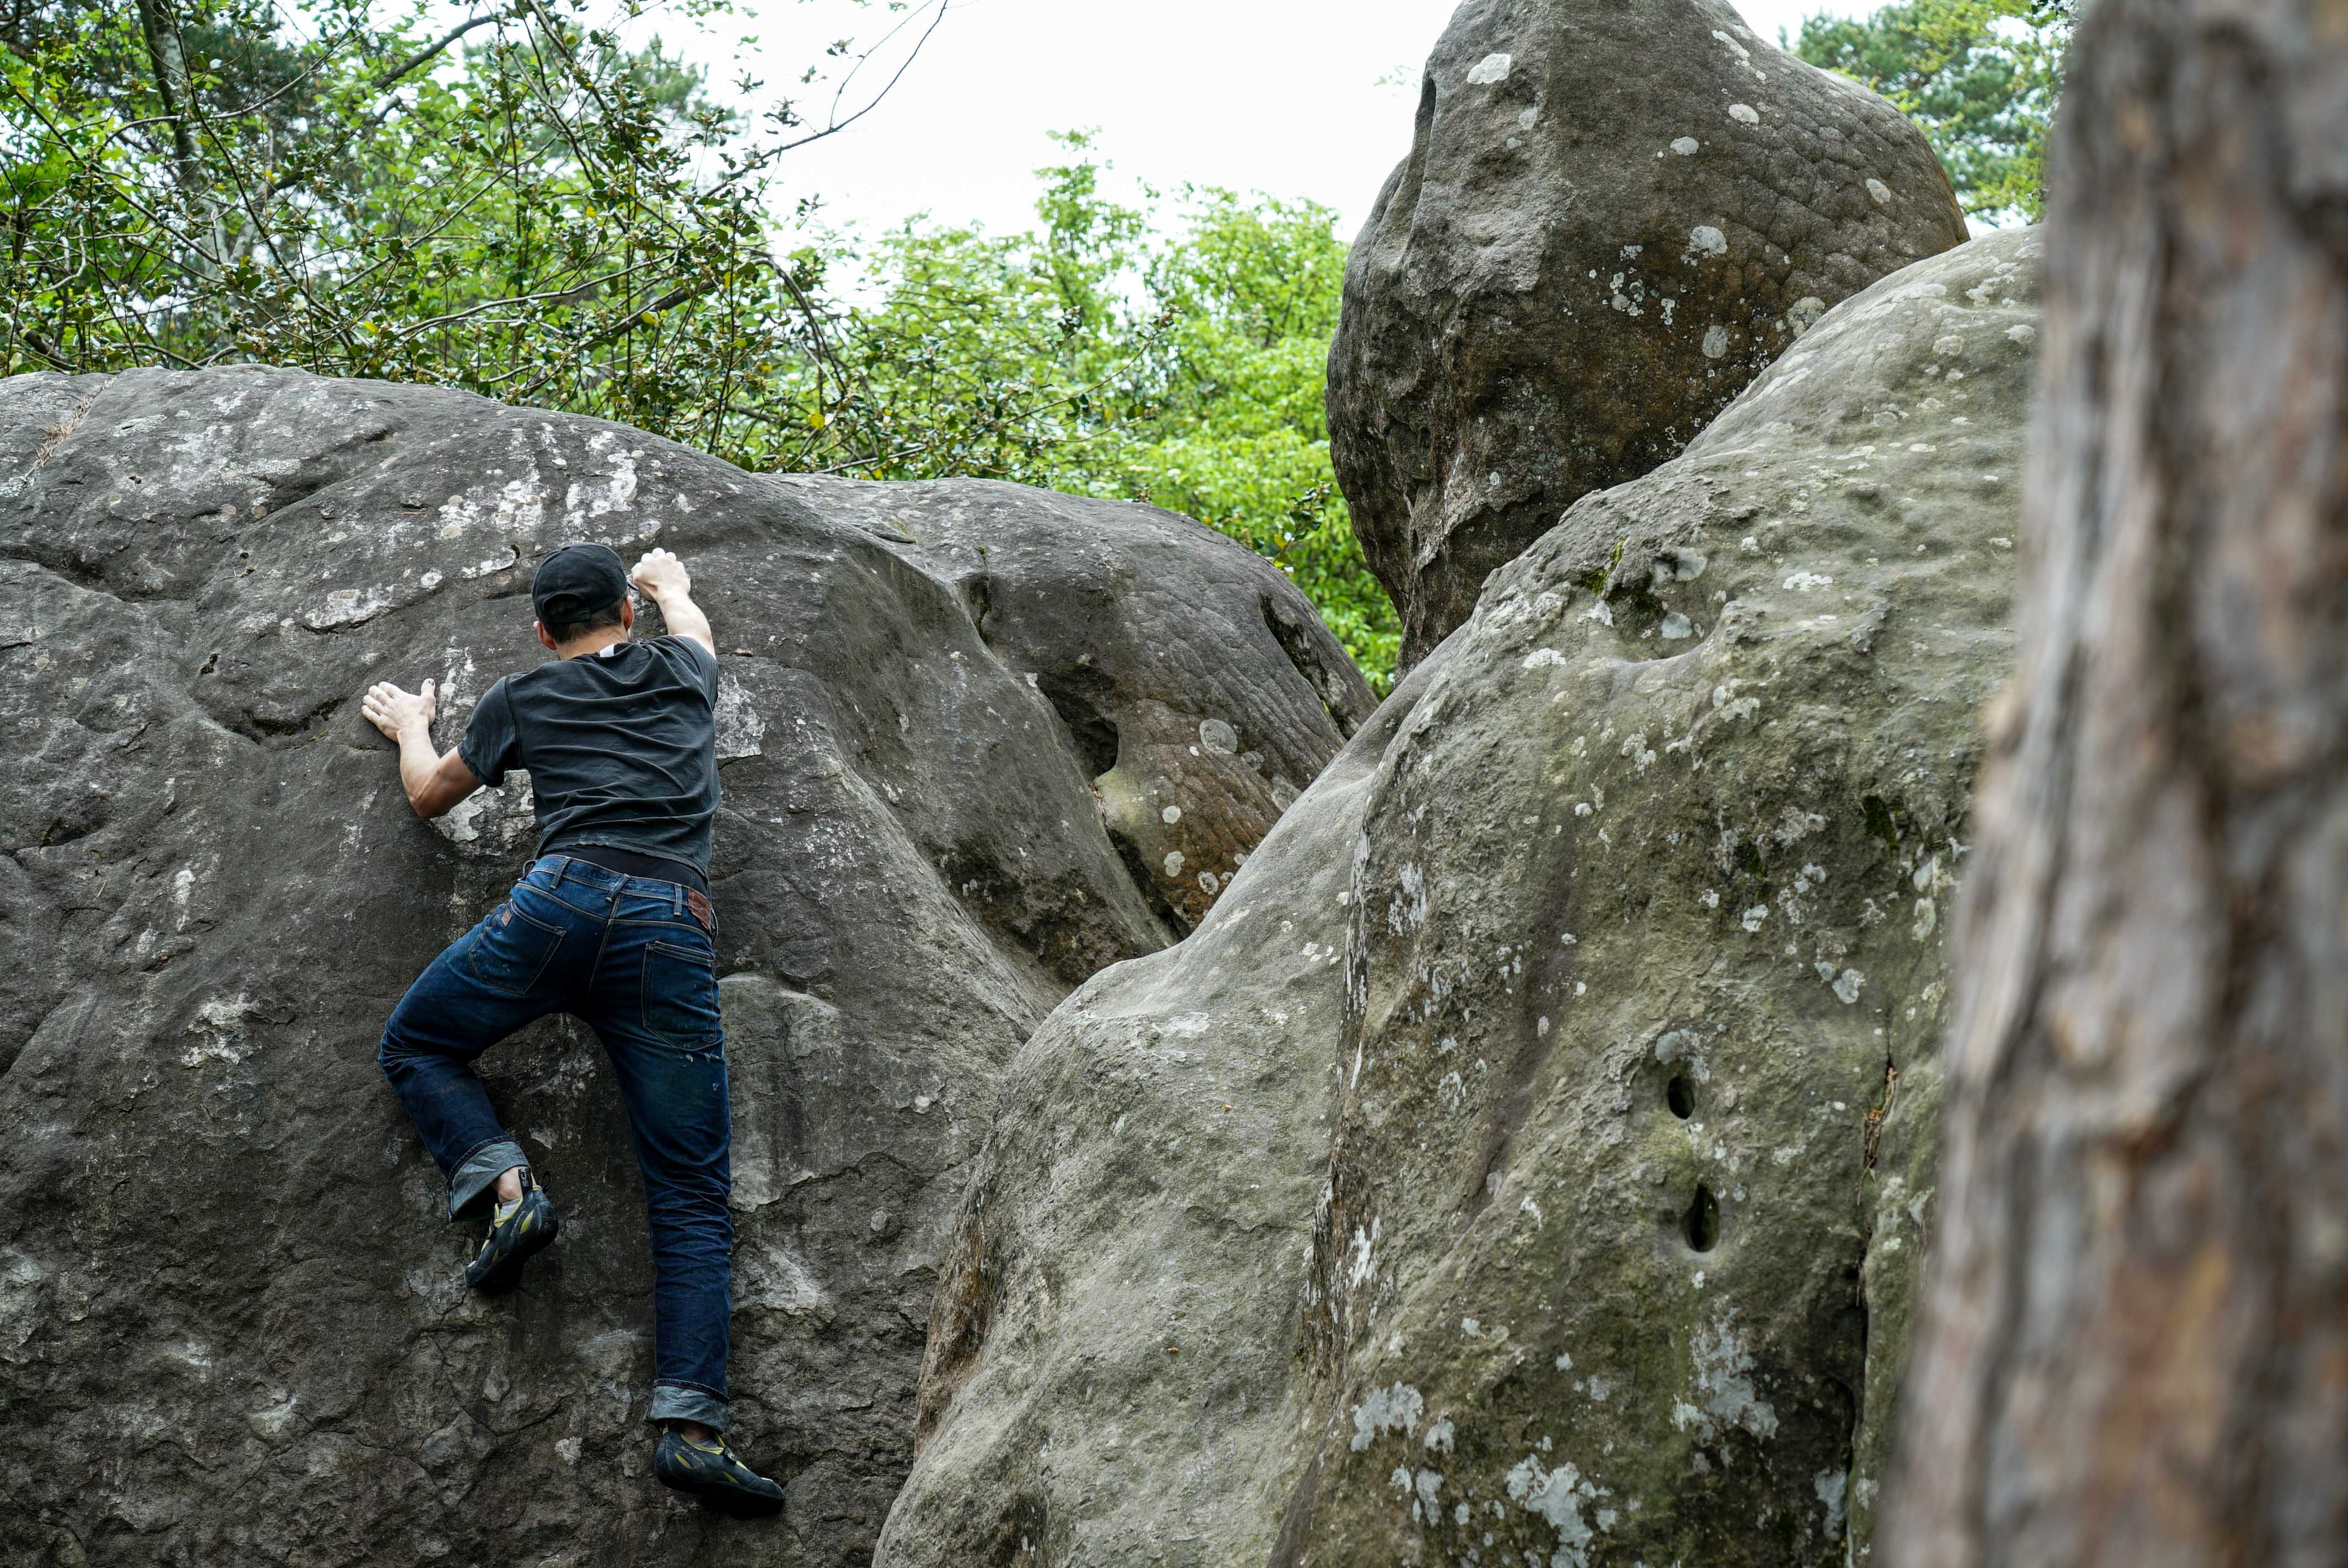 fontainbleau climbing 2016 mike brindley-123